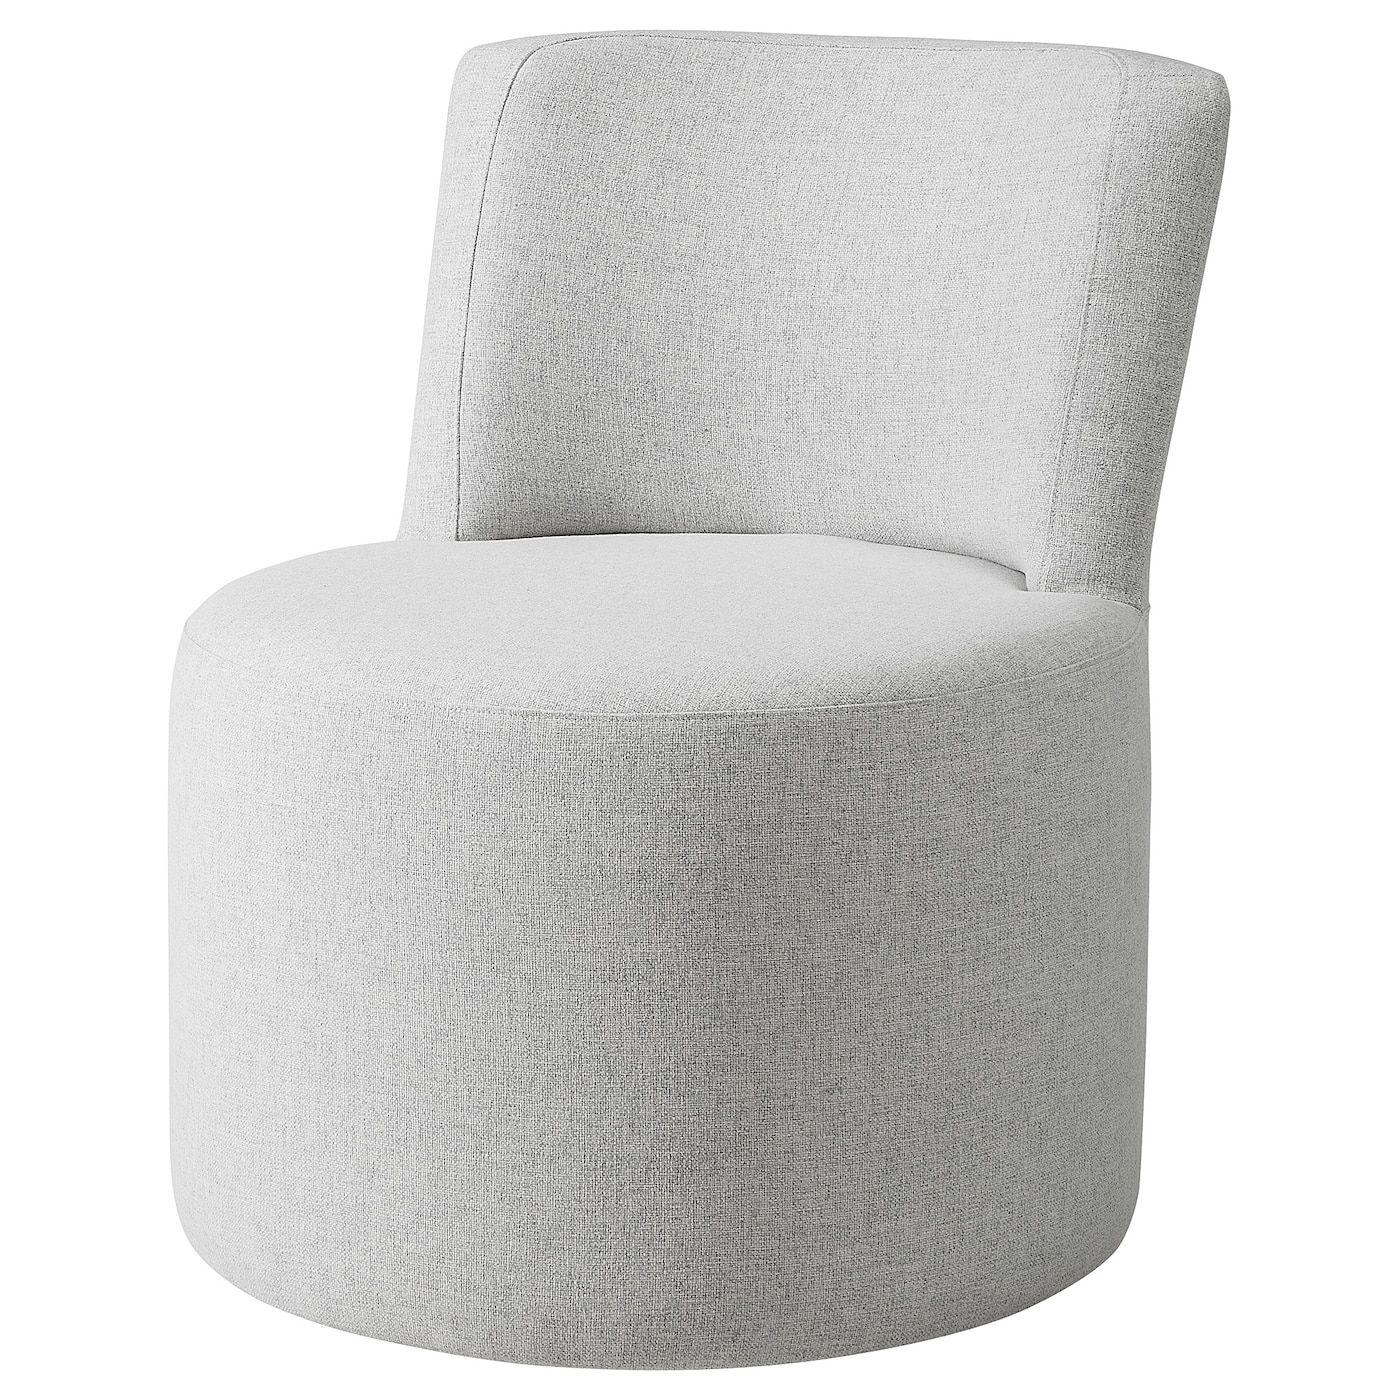 Kolarbo Drehsessel Gunnared Beige Ikea Deutschland Drehsessel Stuhl Metall Sessel